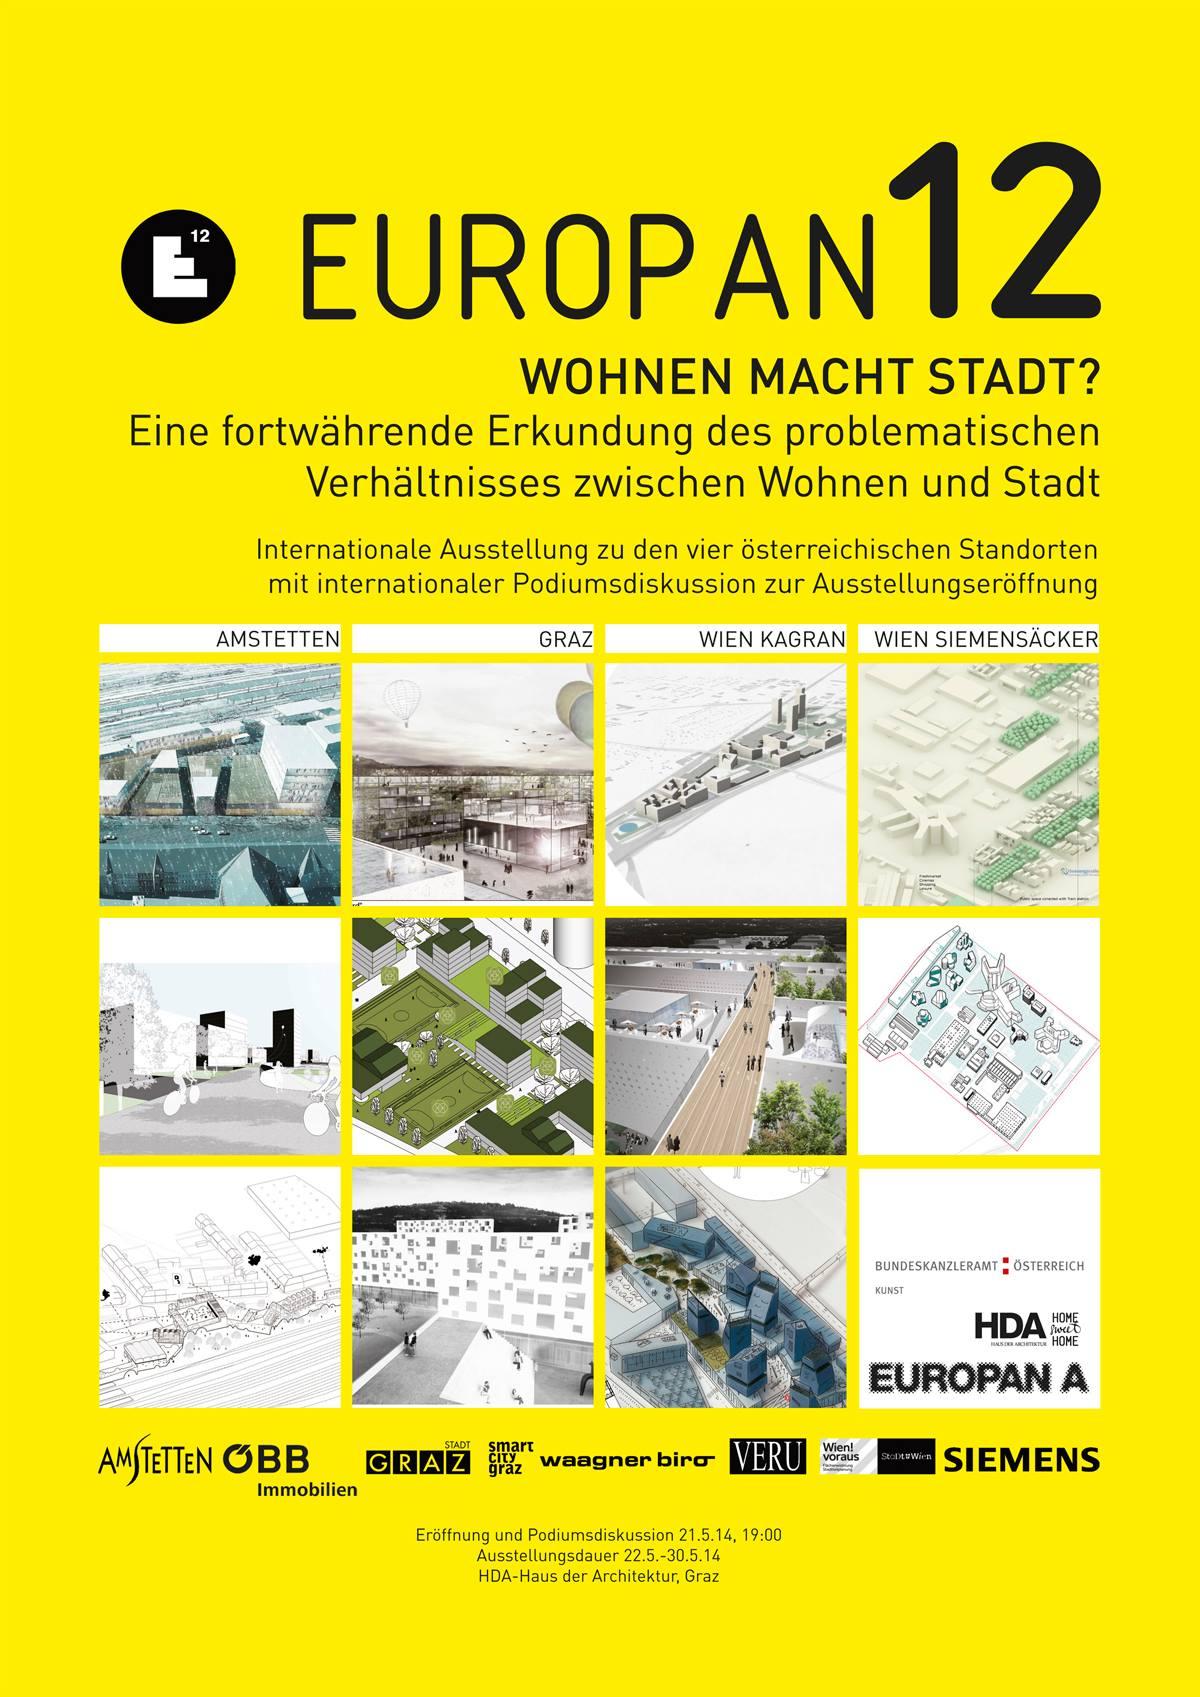 europan 12 austria exhibition